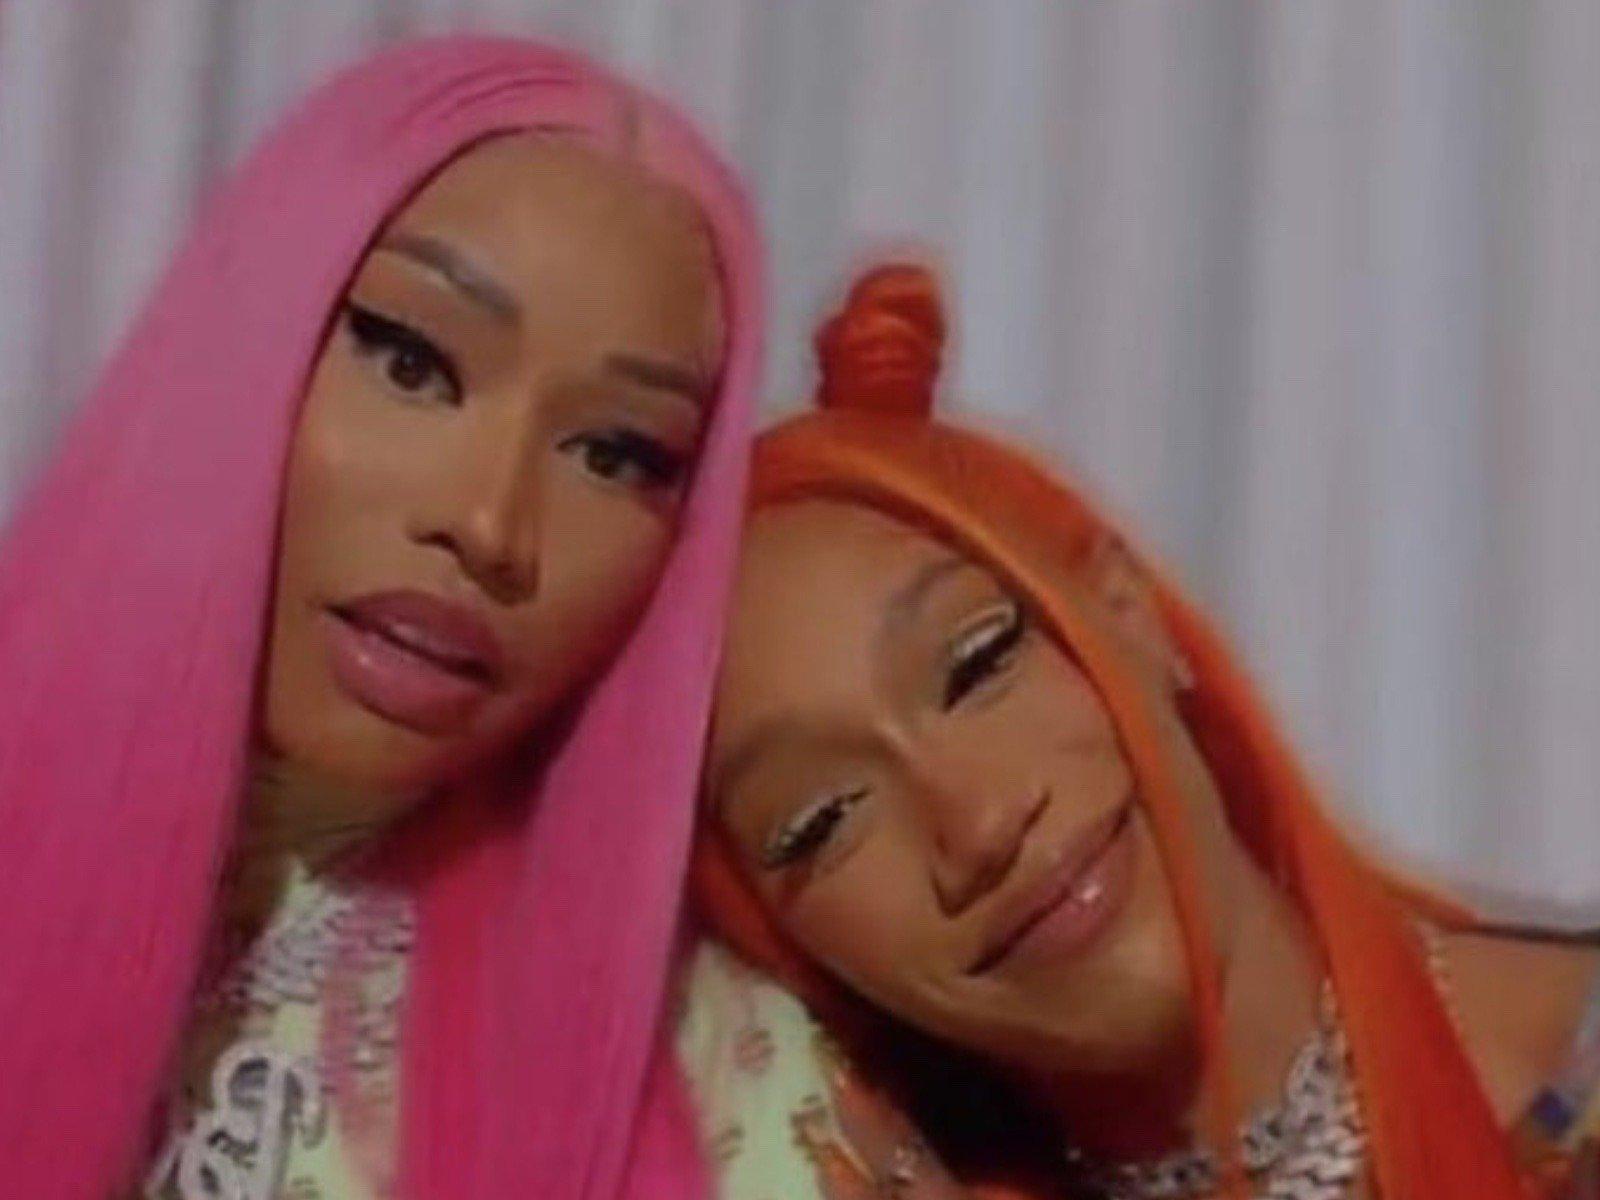 Nicki Minaj Can't Believe Young Thug's All-Pink Fashion Slay  SOHH.com